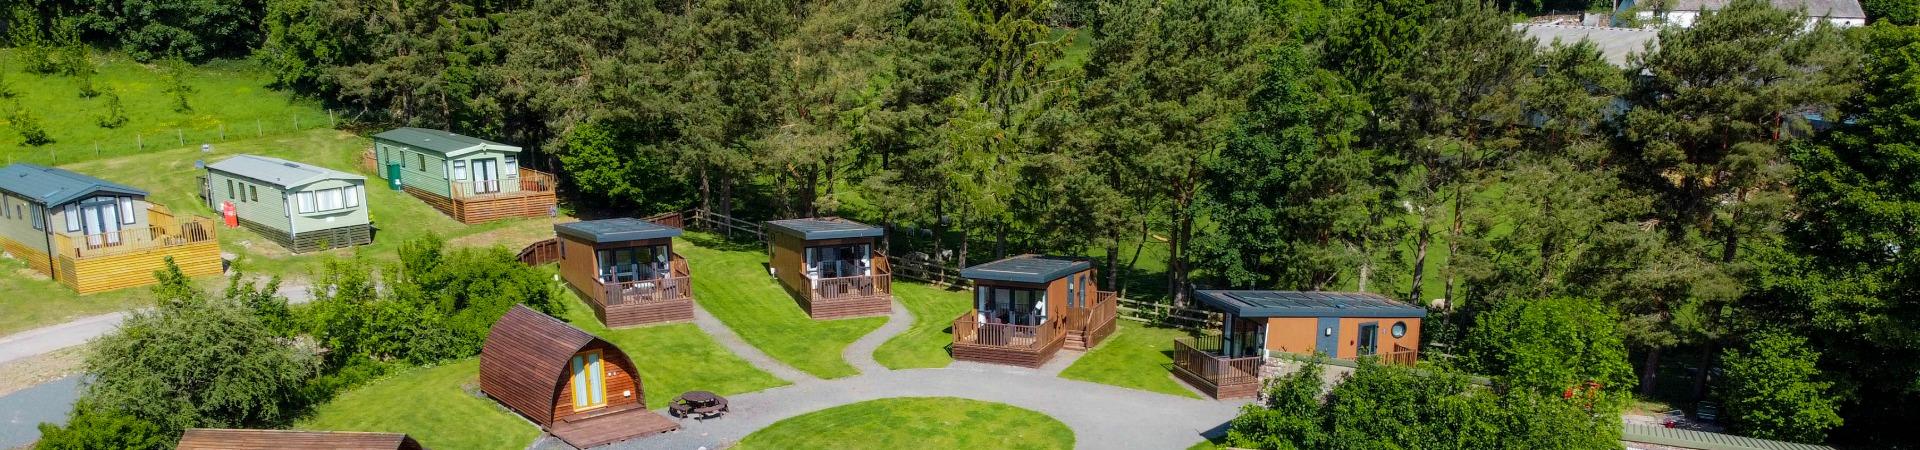 Ullswater Holiday Park